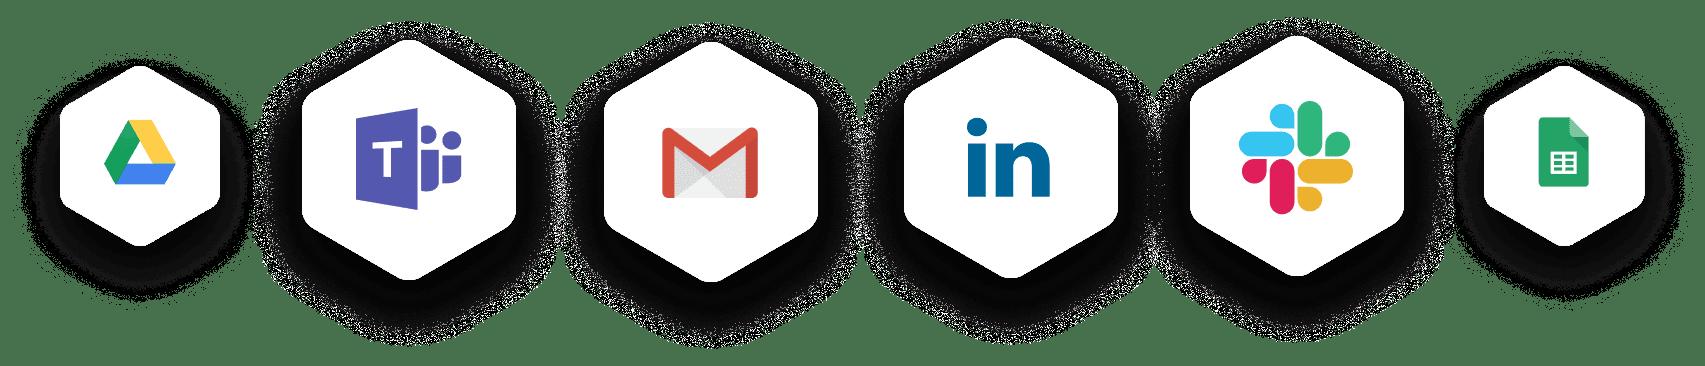 Logos for Google Drive, Microsoft Teams, Gmail, LinkedIn, Slack, and Google Docs